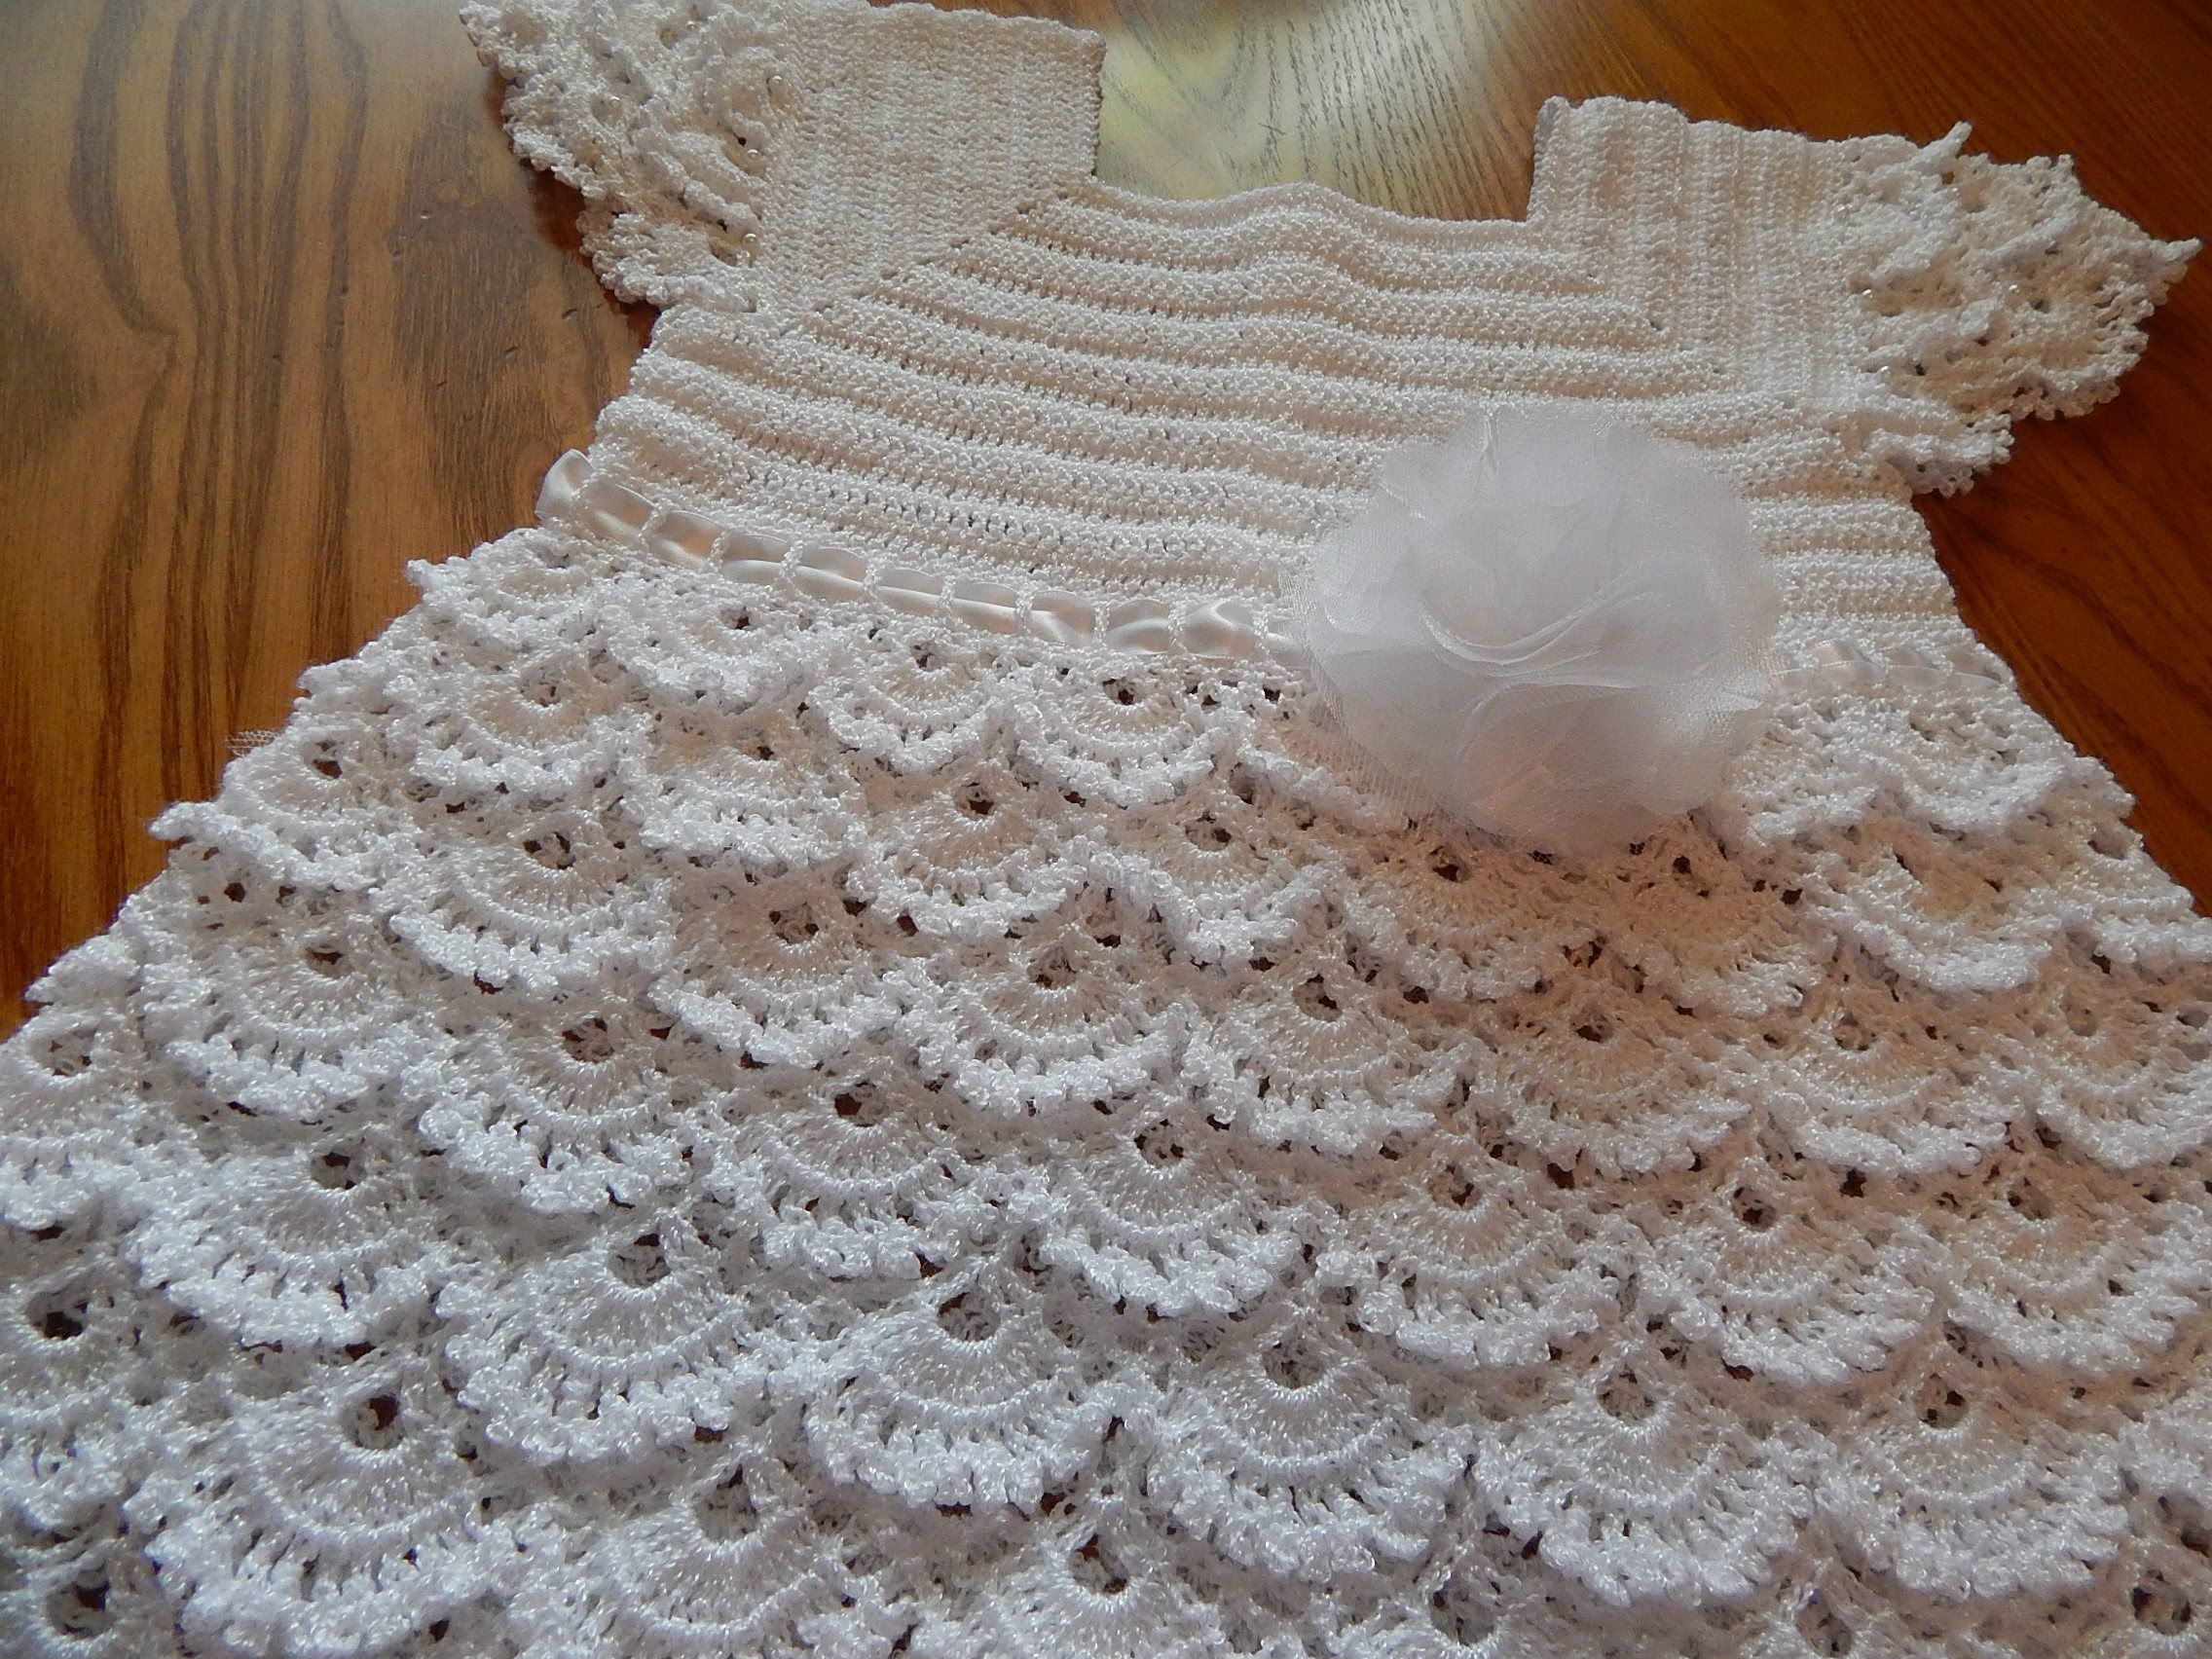 Vestido Blanco Crochet parte 2 de 3 | tejido mamá | Pinterest ...